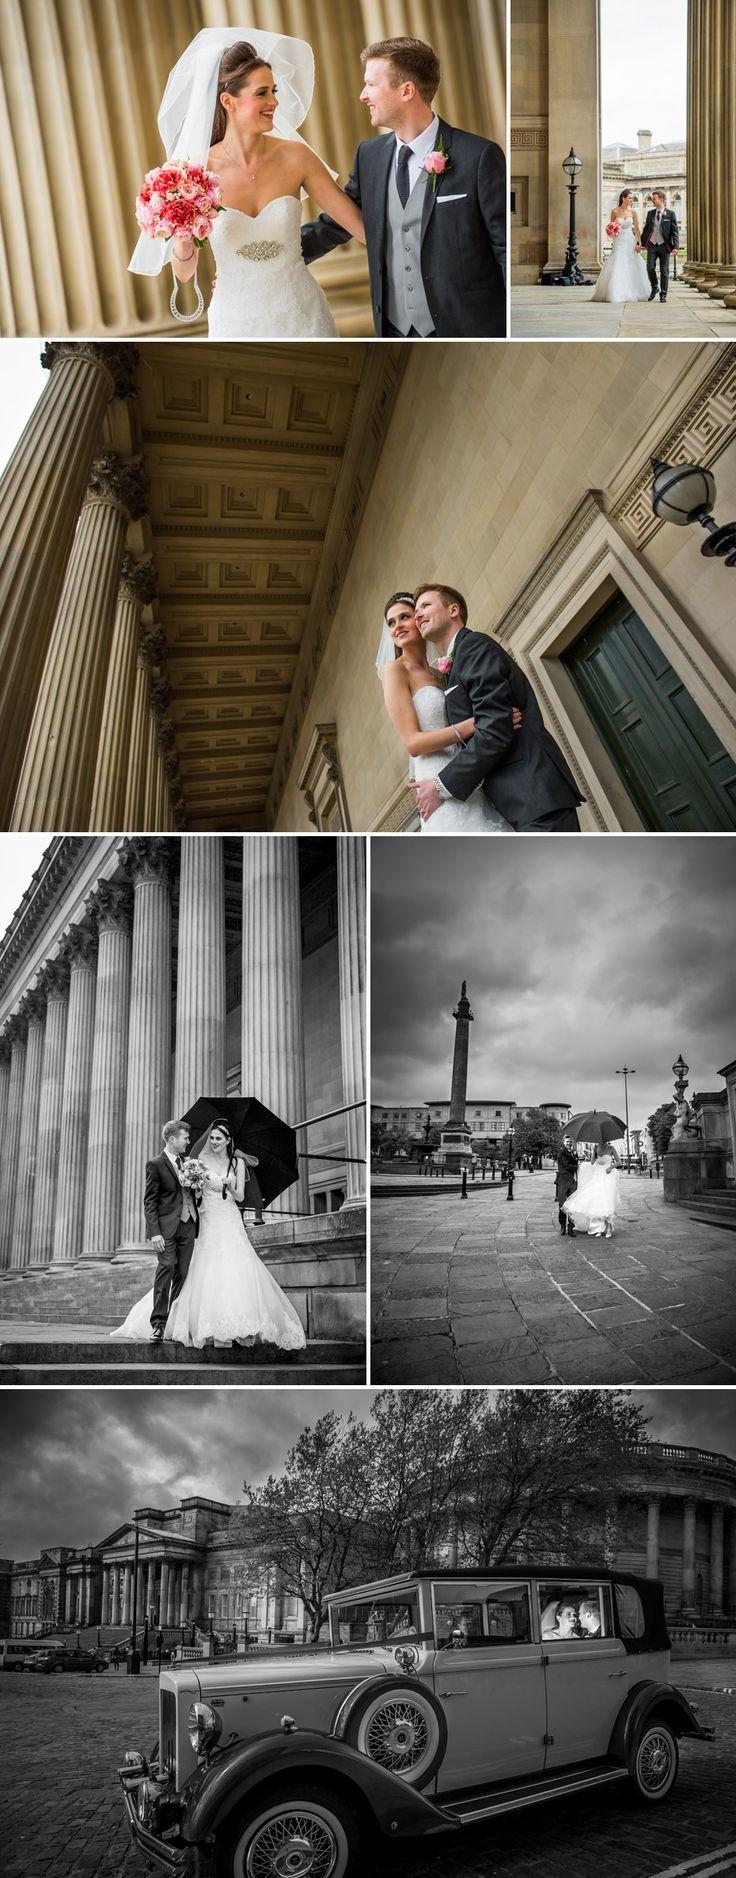 St George's Hall Wedding Photography, Liverpool, wedding car, rain. www.matthewrycraft.co.uk